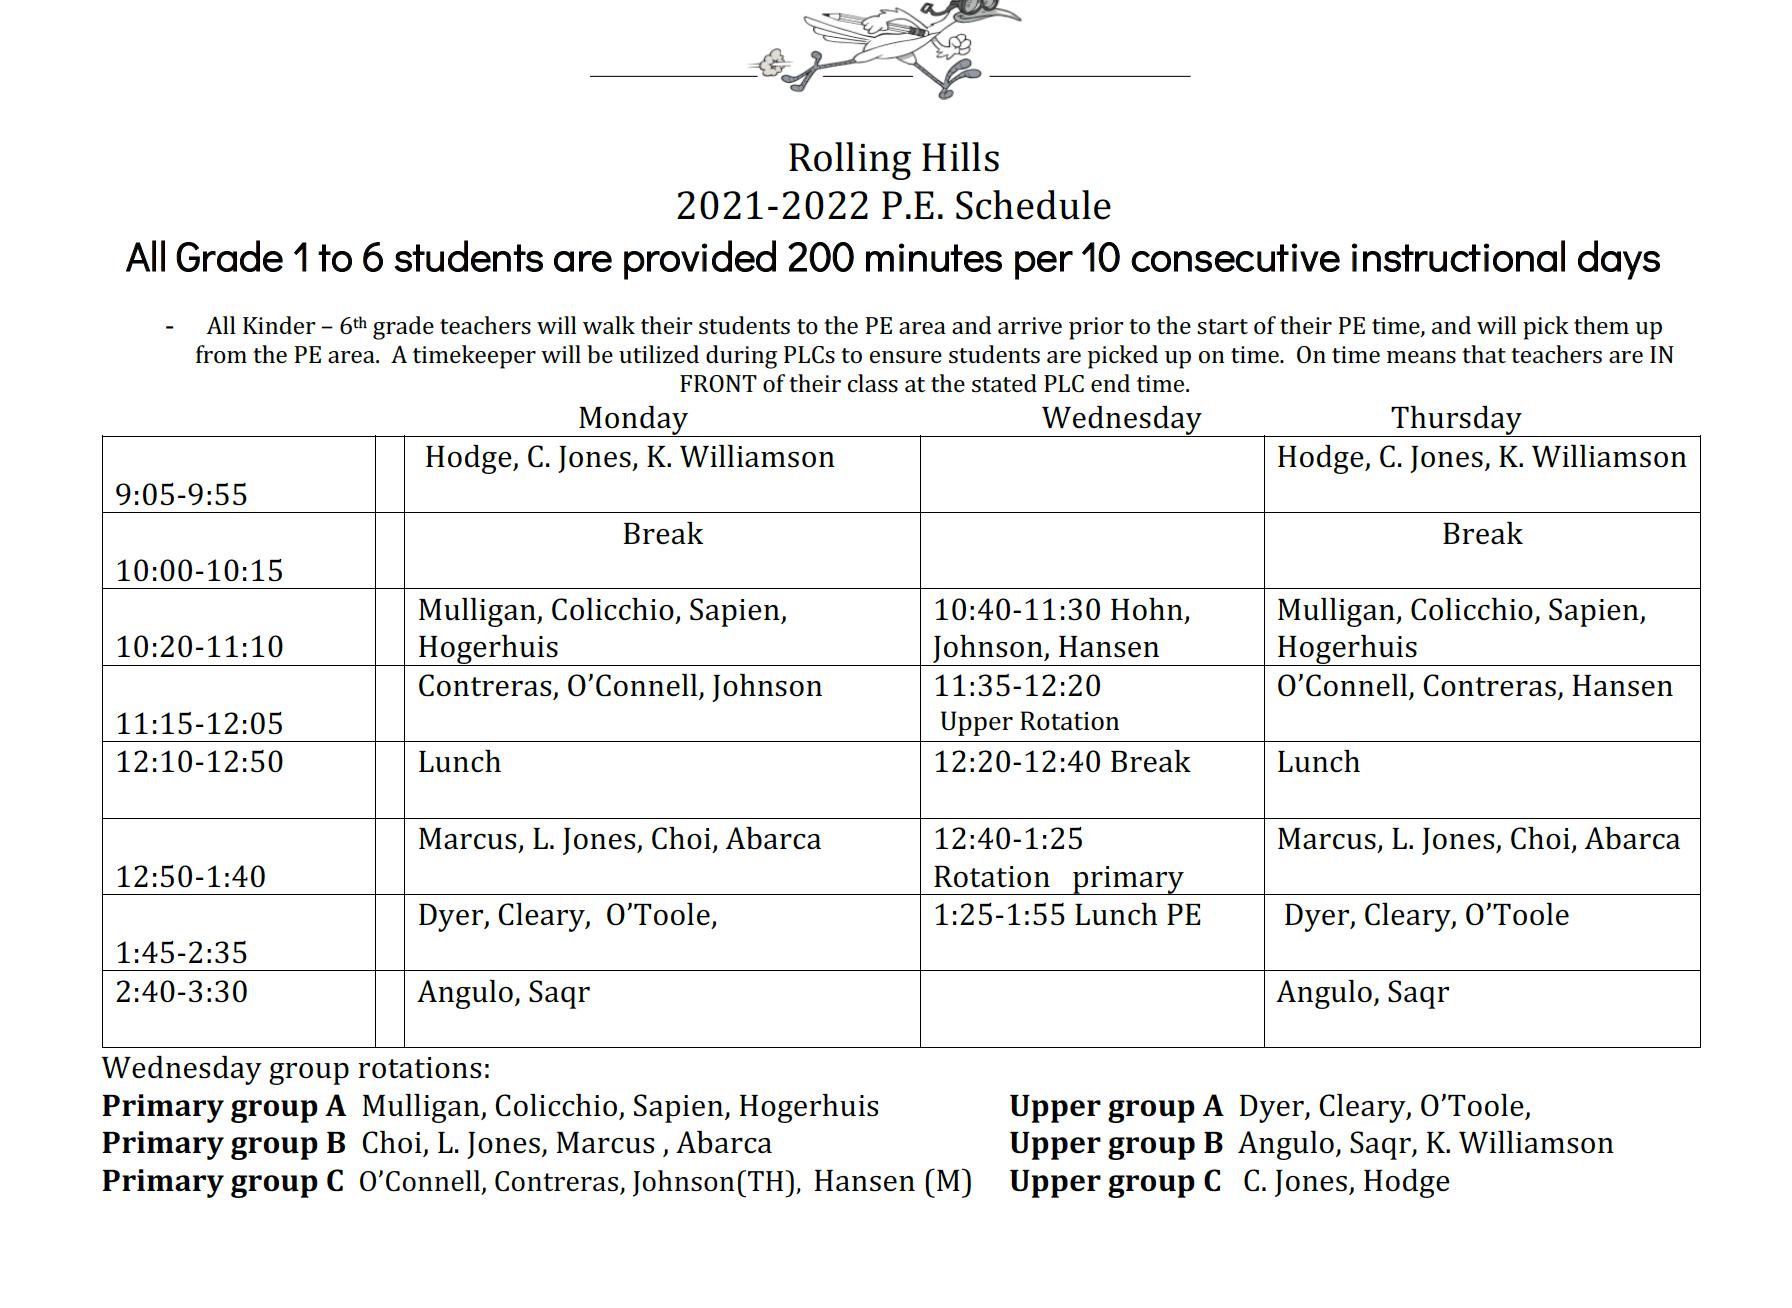 RH PE Schedule 2021-22